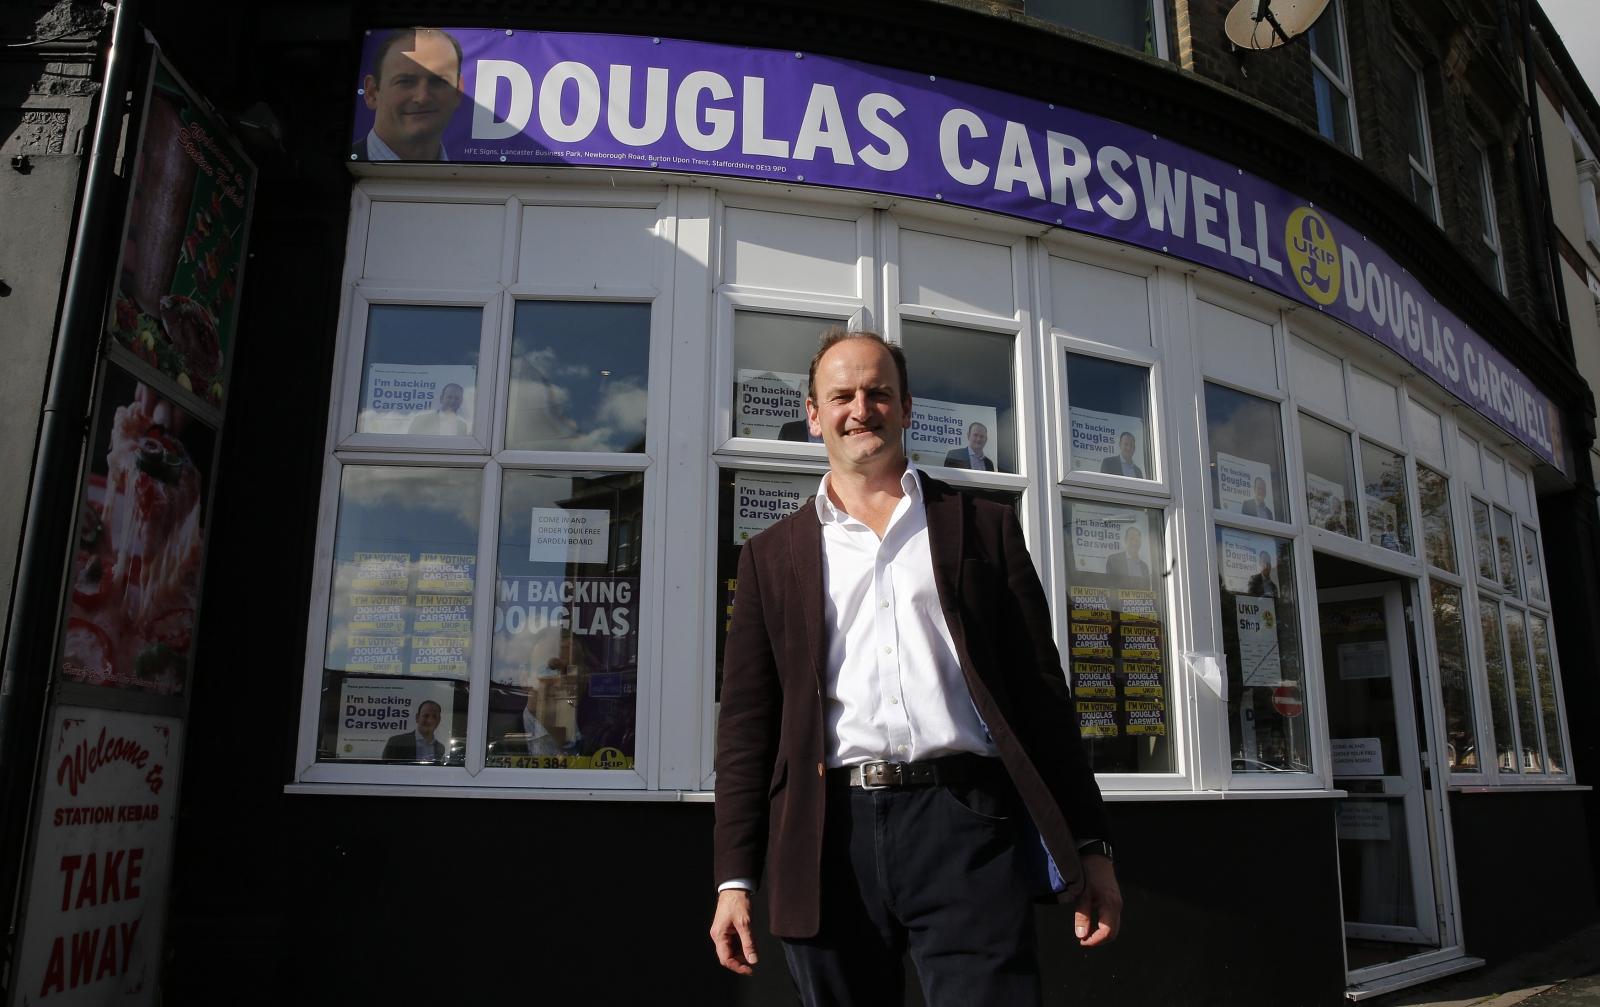 Douglas Carswell